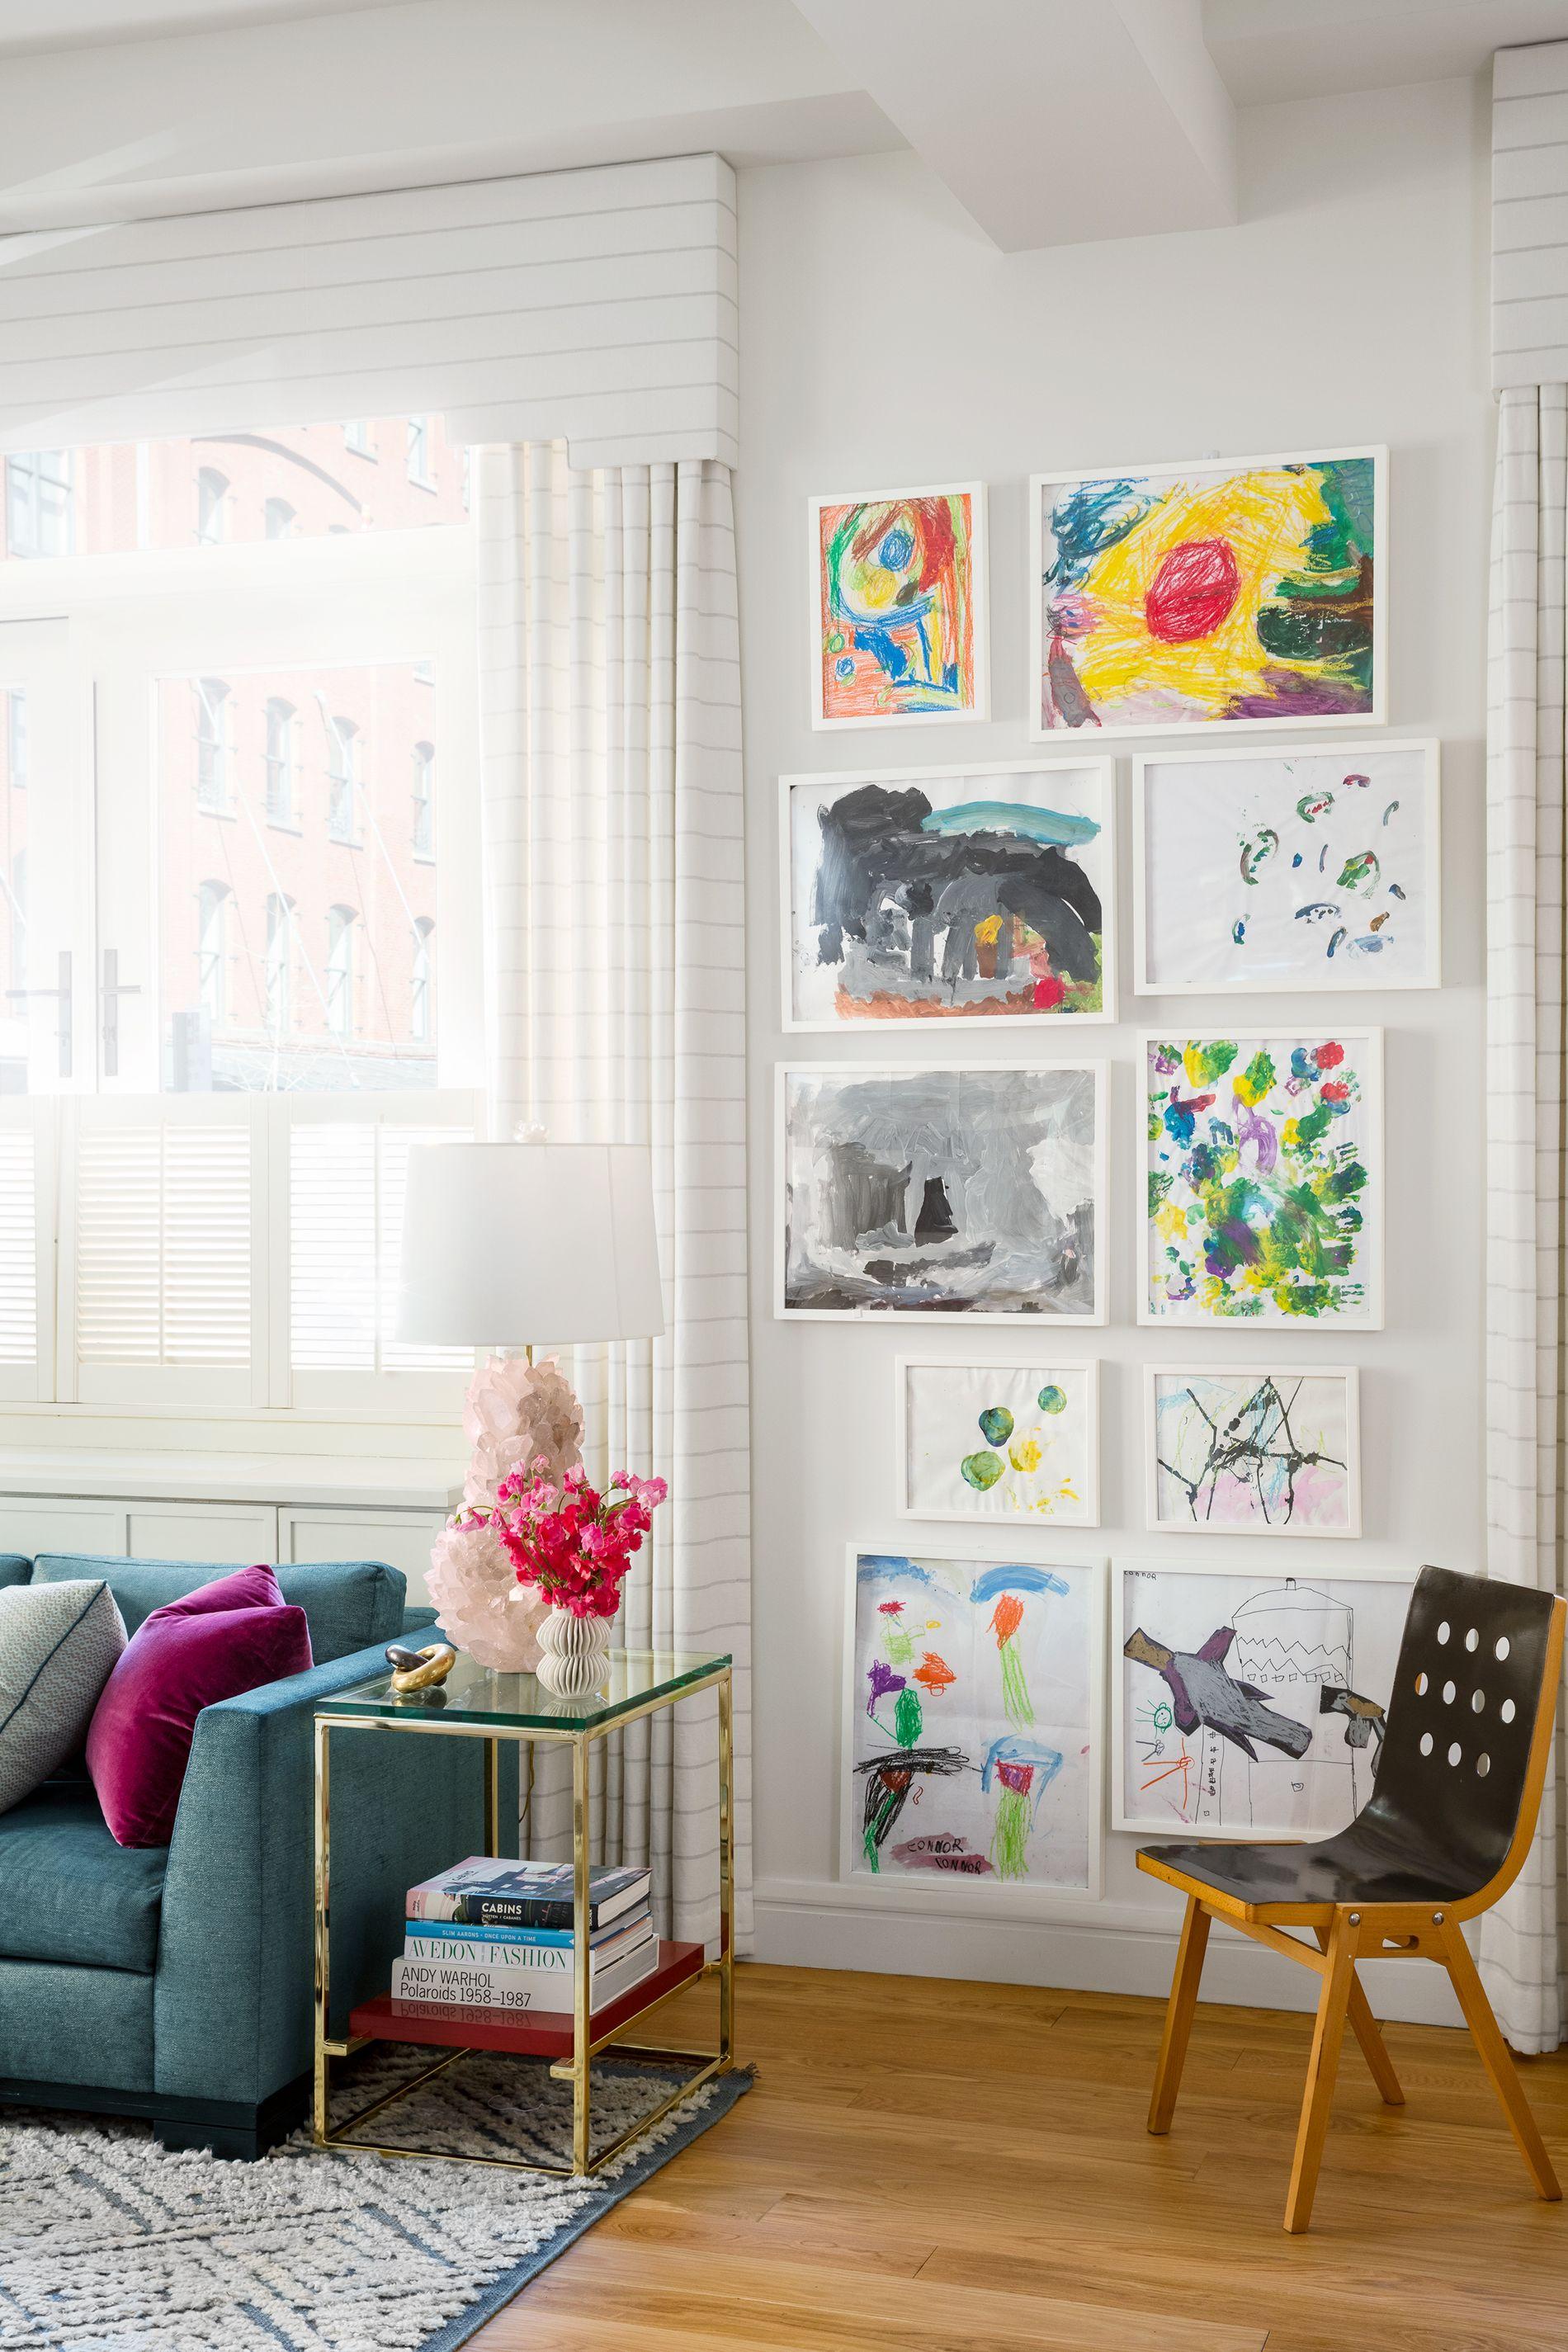 20 Family Friendly Decorating Ideas Stylish Kid Proof Decor Tips